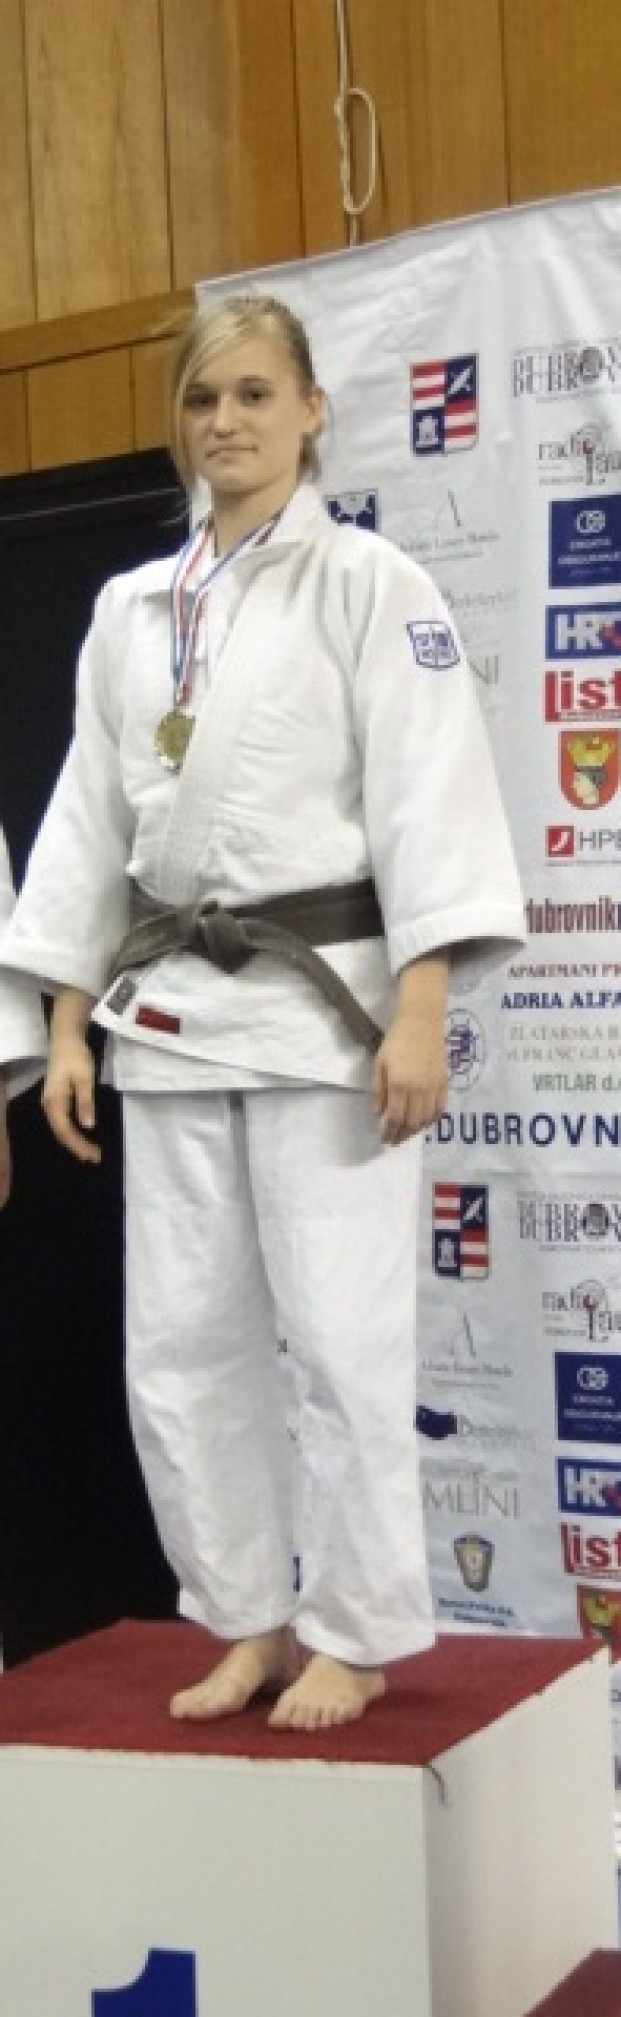 prvenstvo hrvatske za juniore 2012. 2